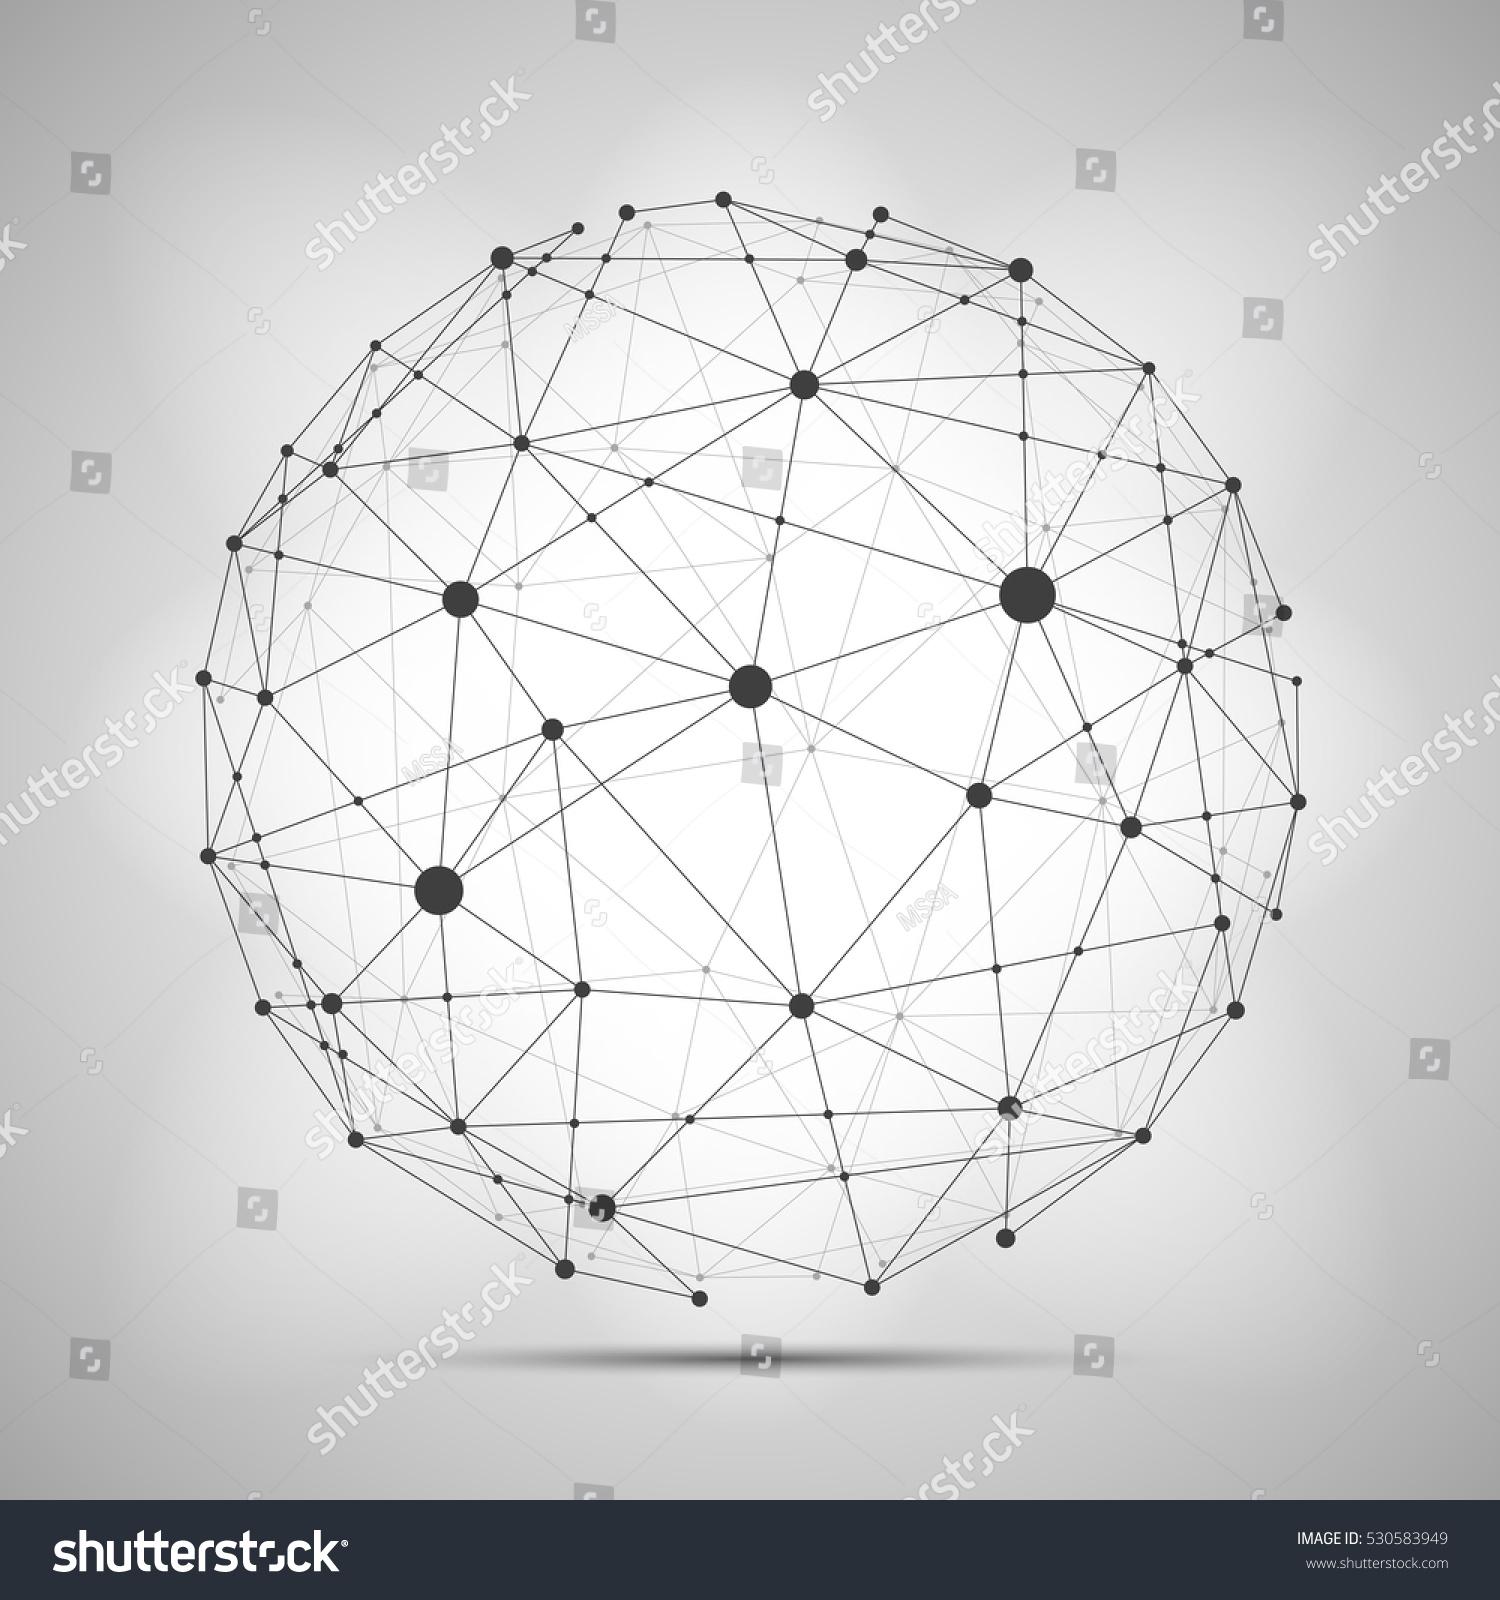 Line Art Vs Halftone : Vector wireframe connecting earth sphere globe stock